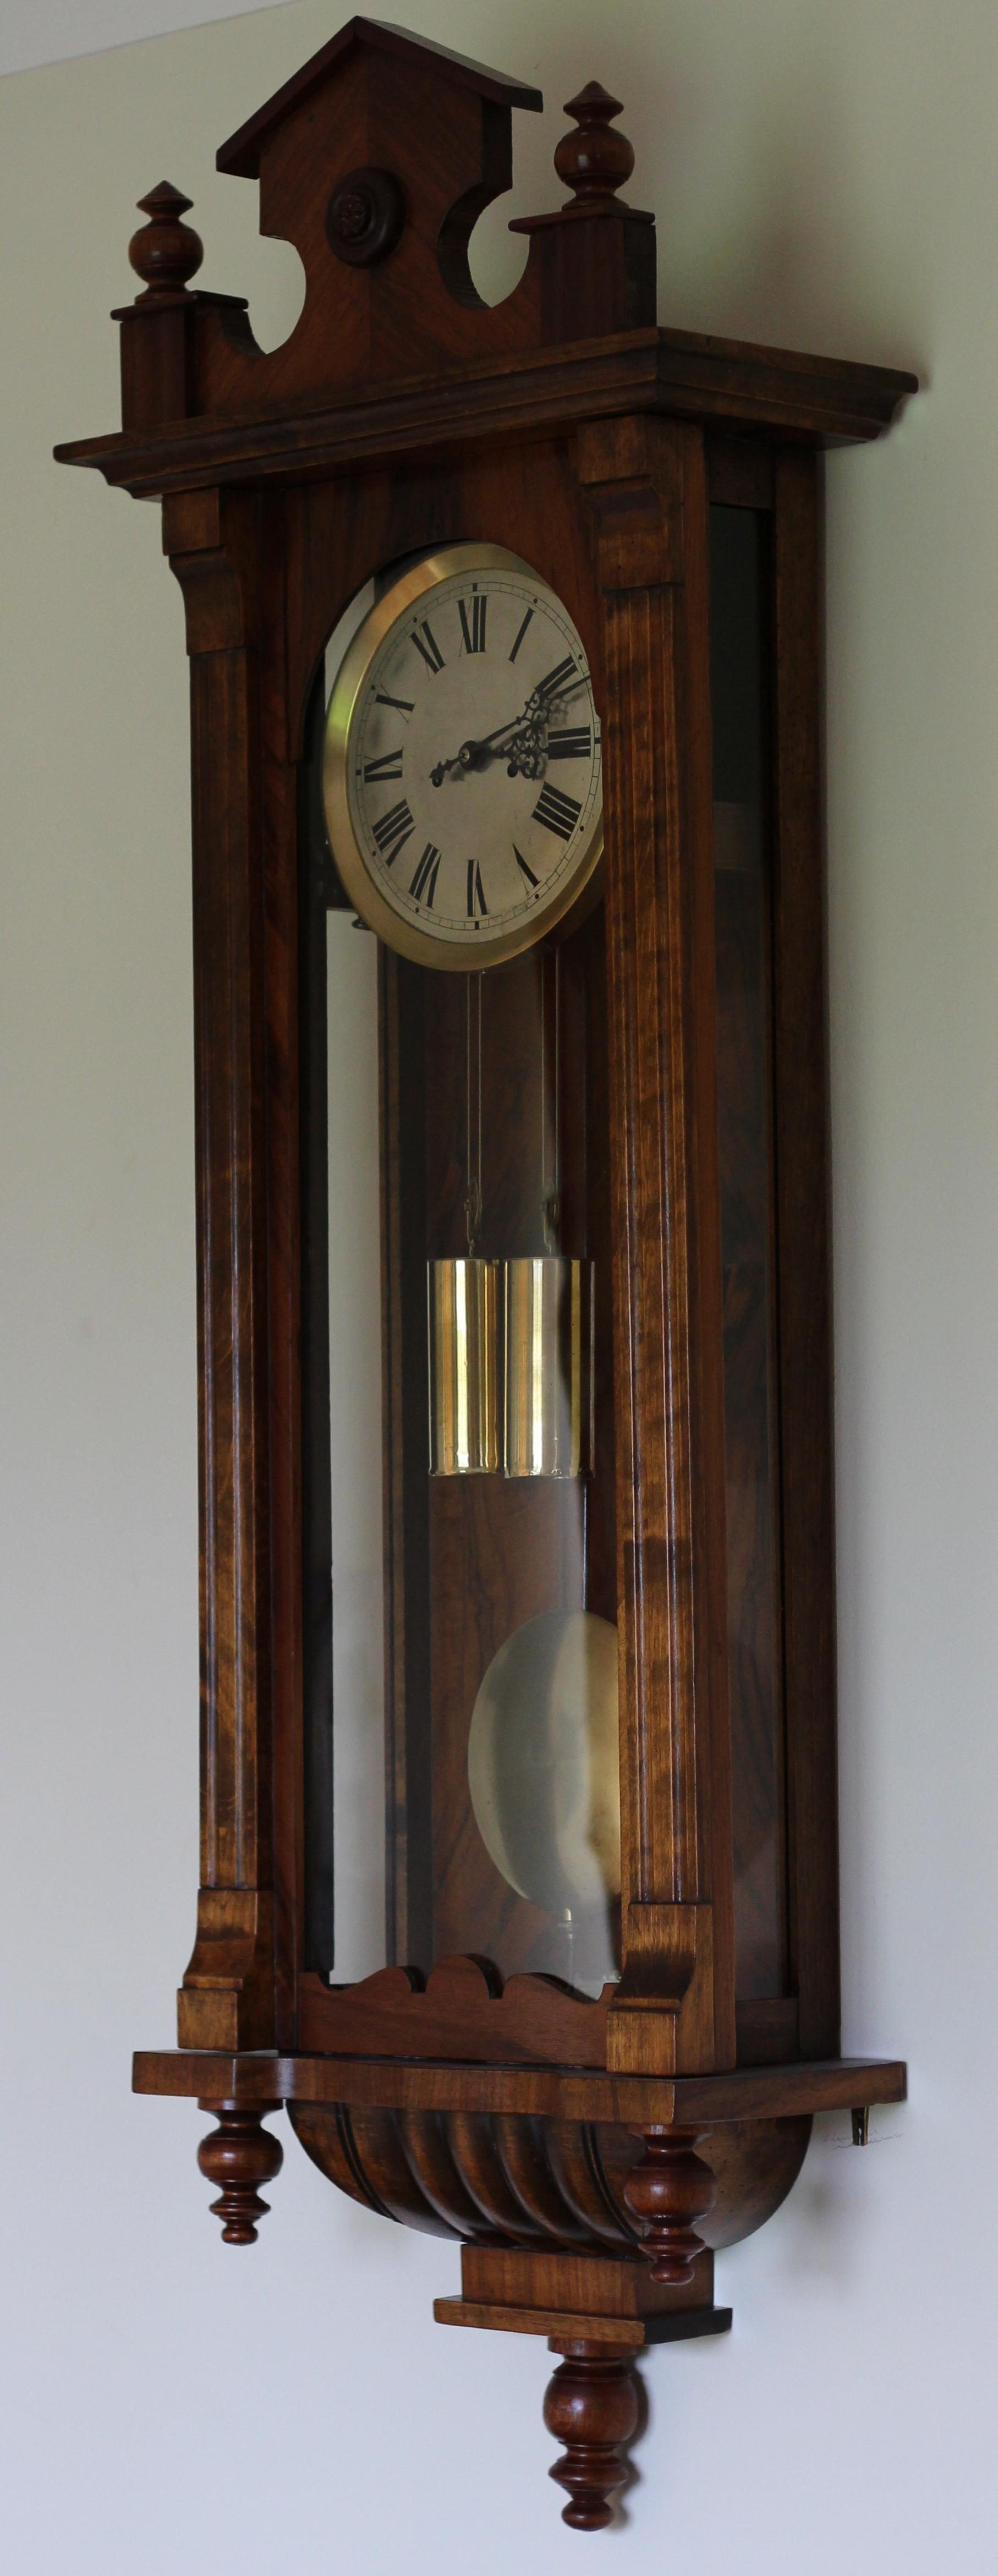 Gustav Becker Double Weight Regulator Clock caseyclockrestoration